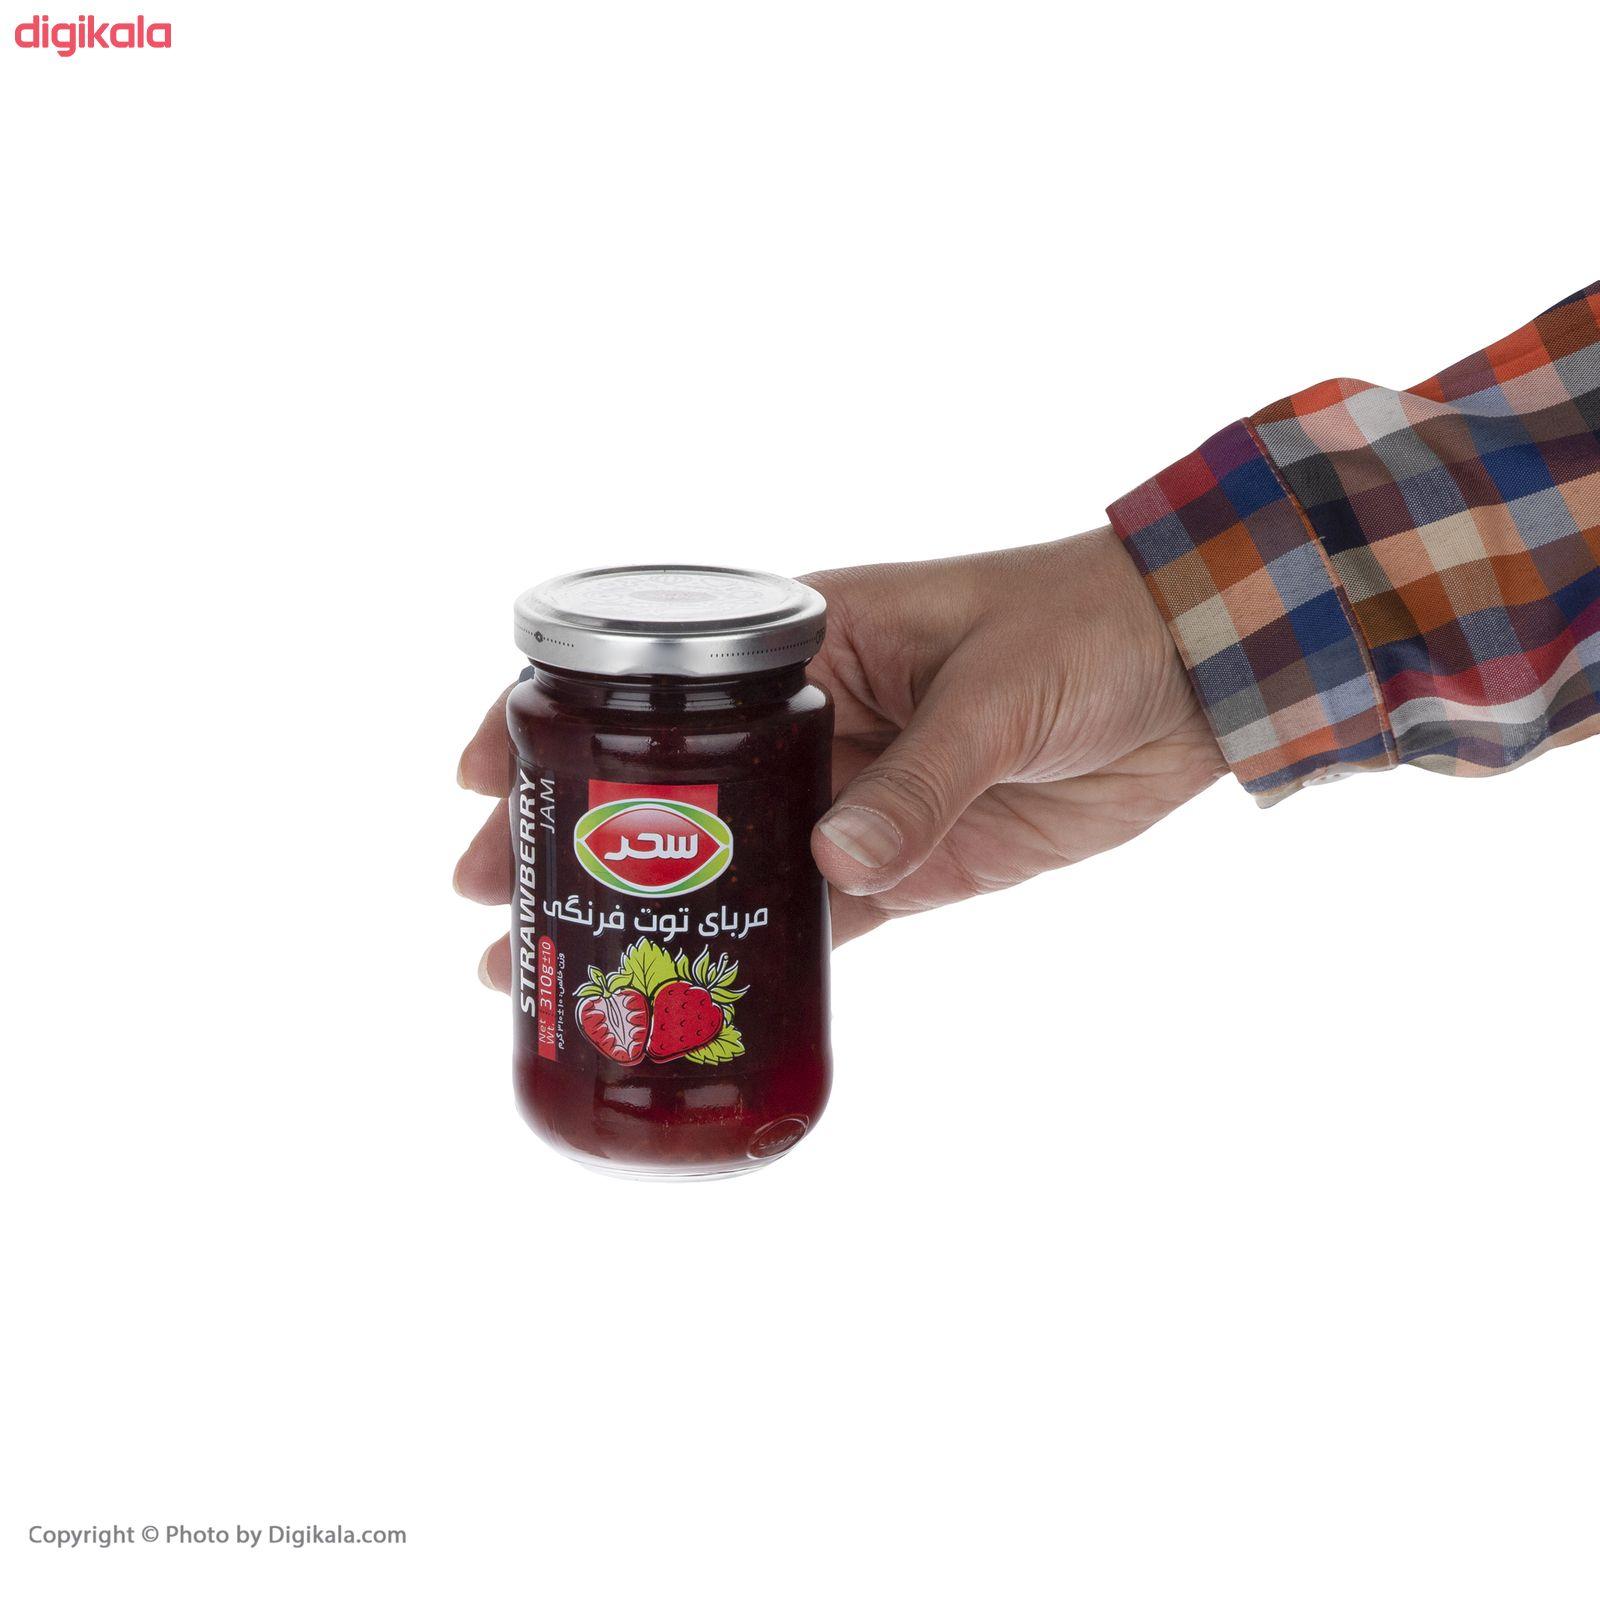 مربای توت فرنگی سحر - 310 گرم  main 1 2